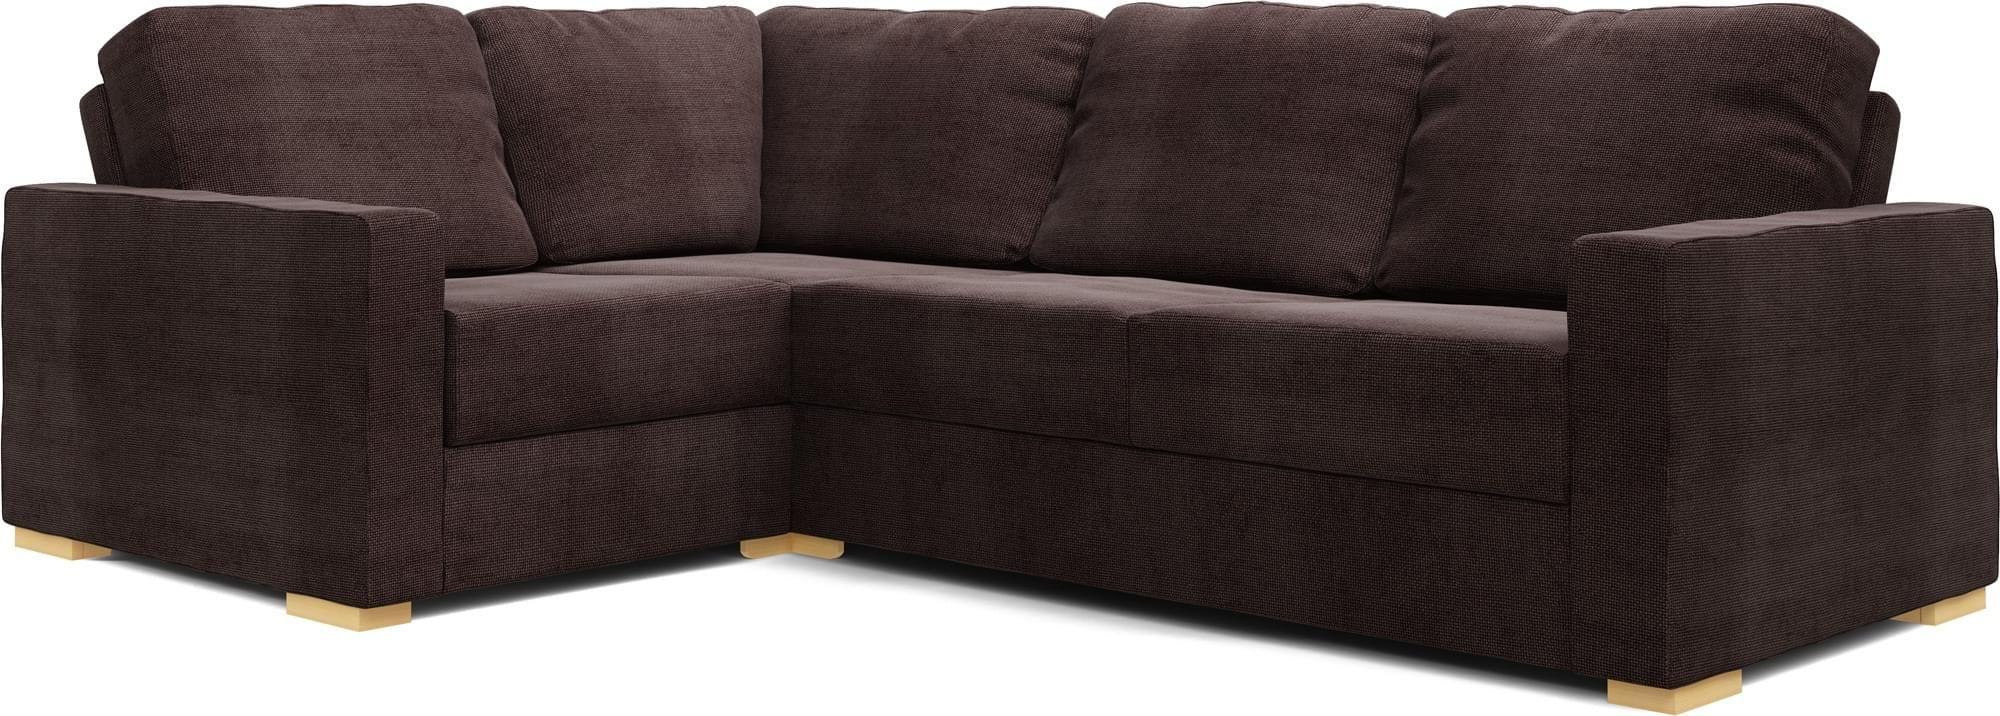 Alda 3X2 Corner Double Sofa Bed | Sofa, Double sofa bed ...